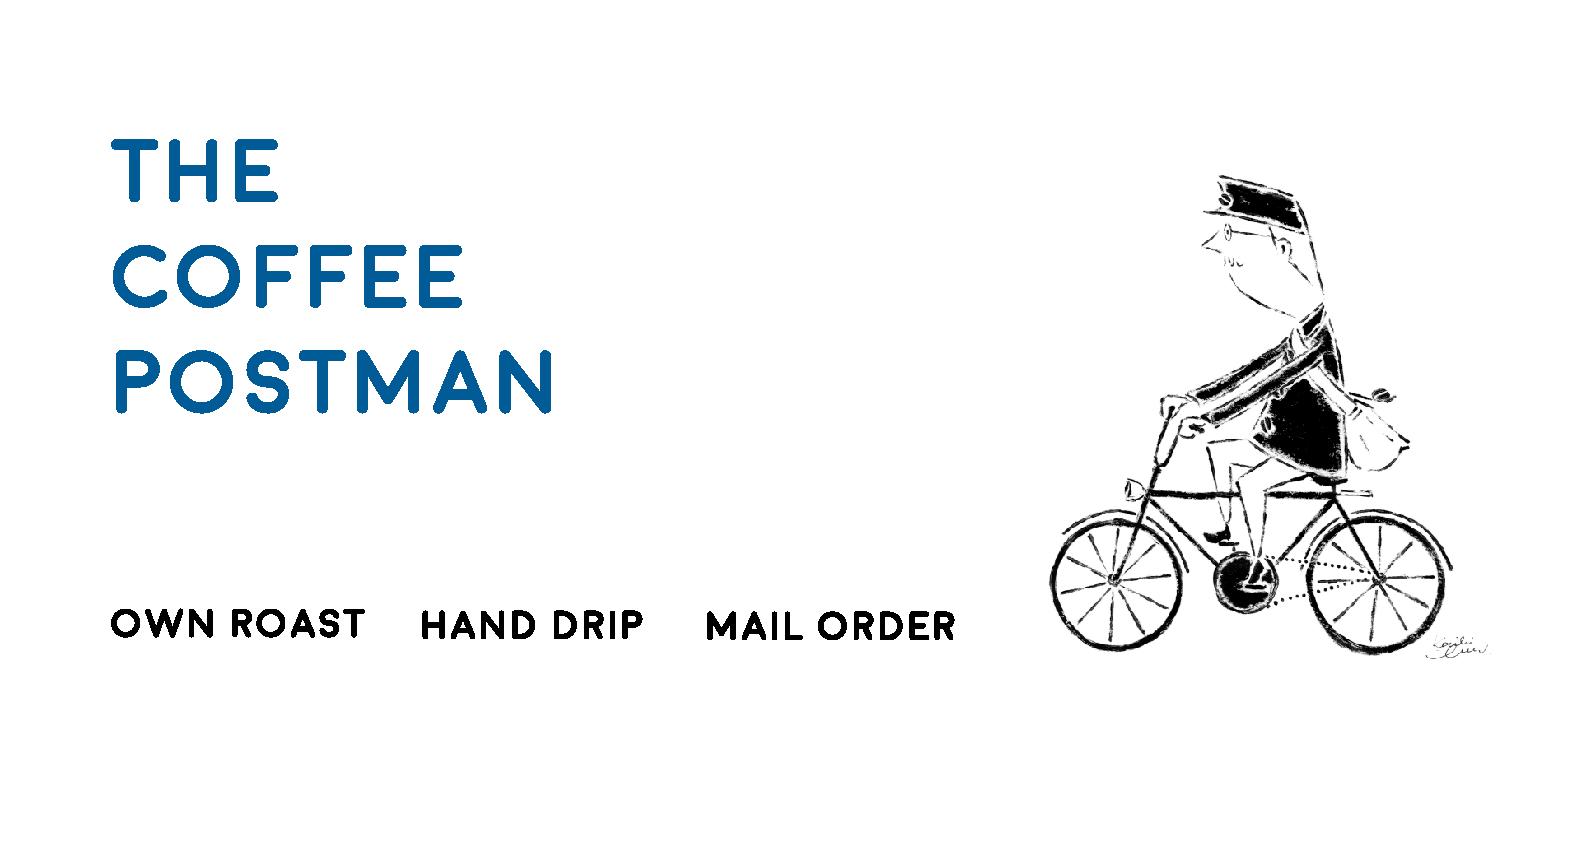 THE COFFEE POSTMAN